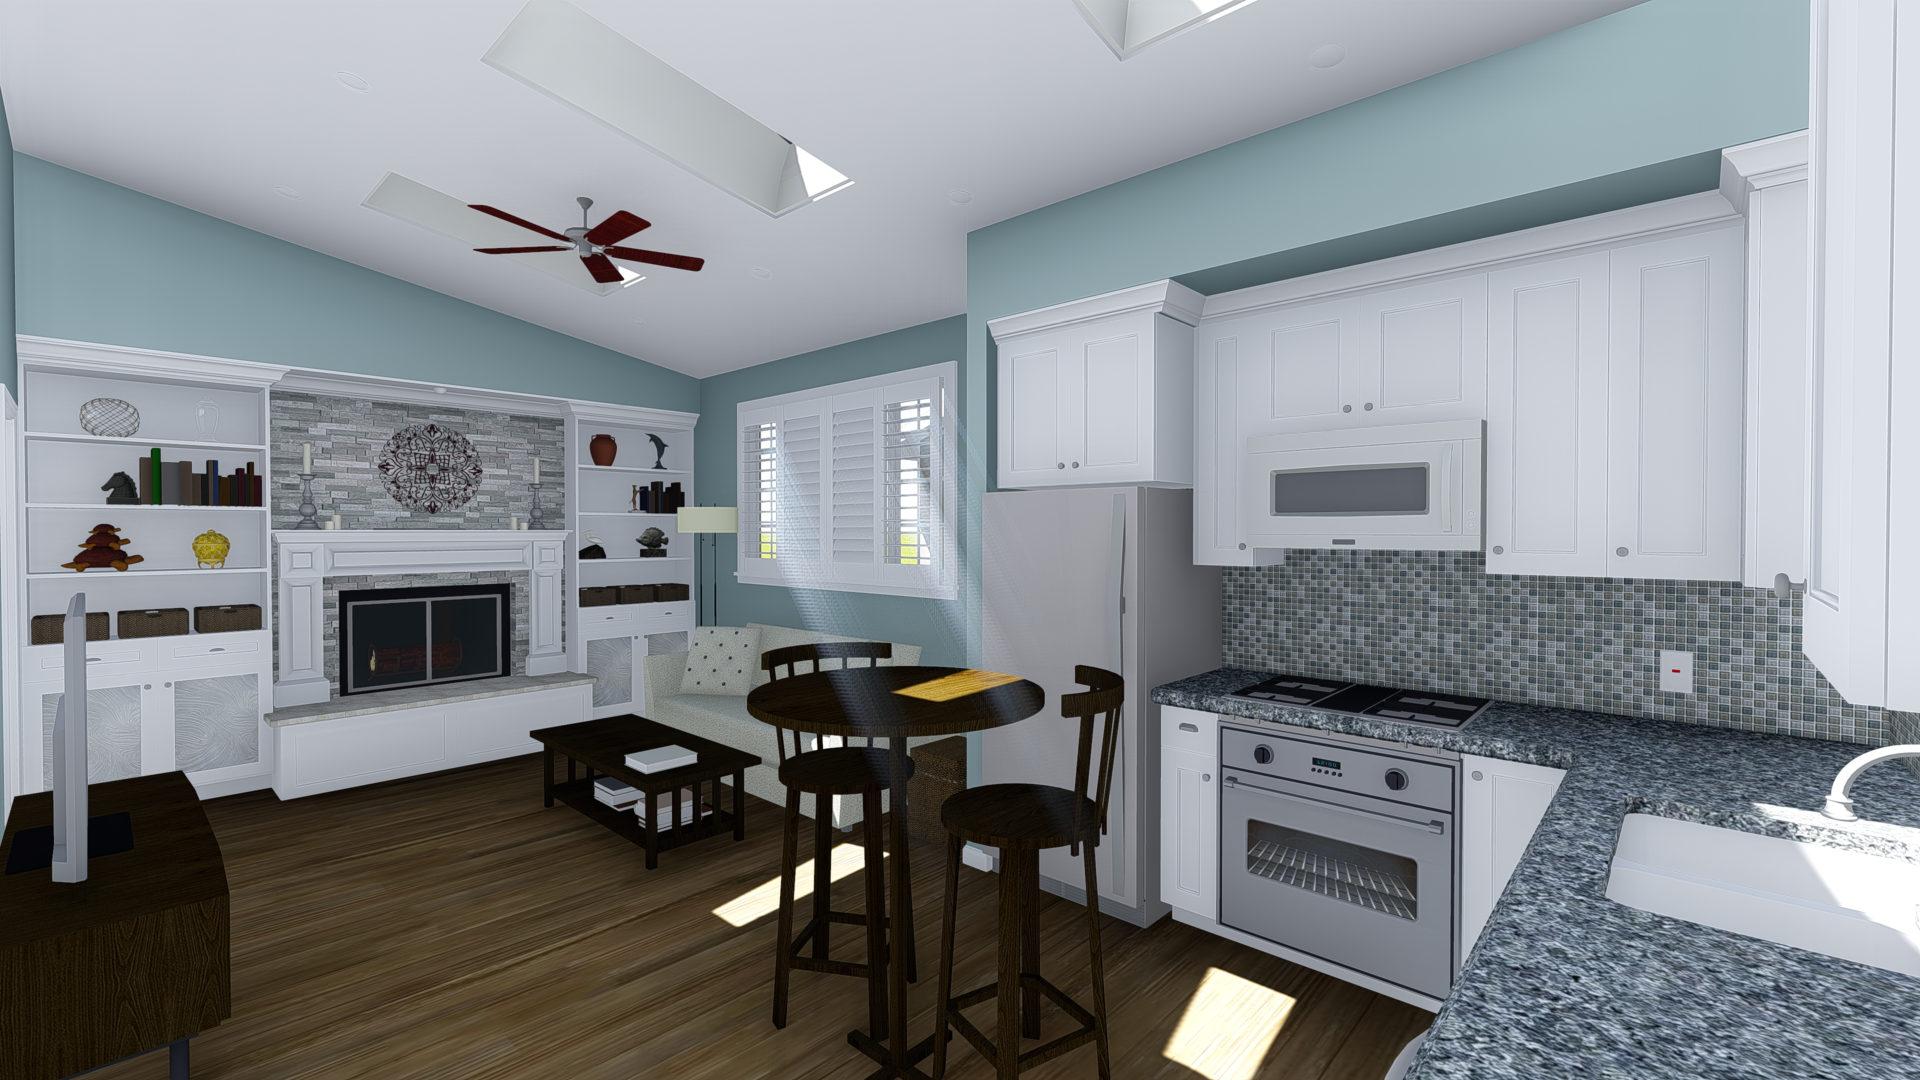 Design-05-Kitchenette-and-Living-e1495345495268